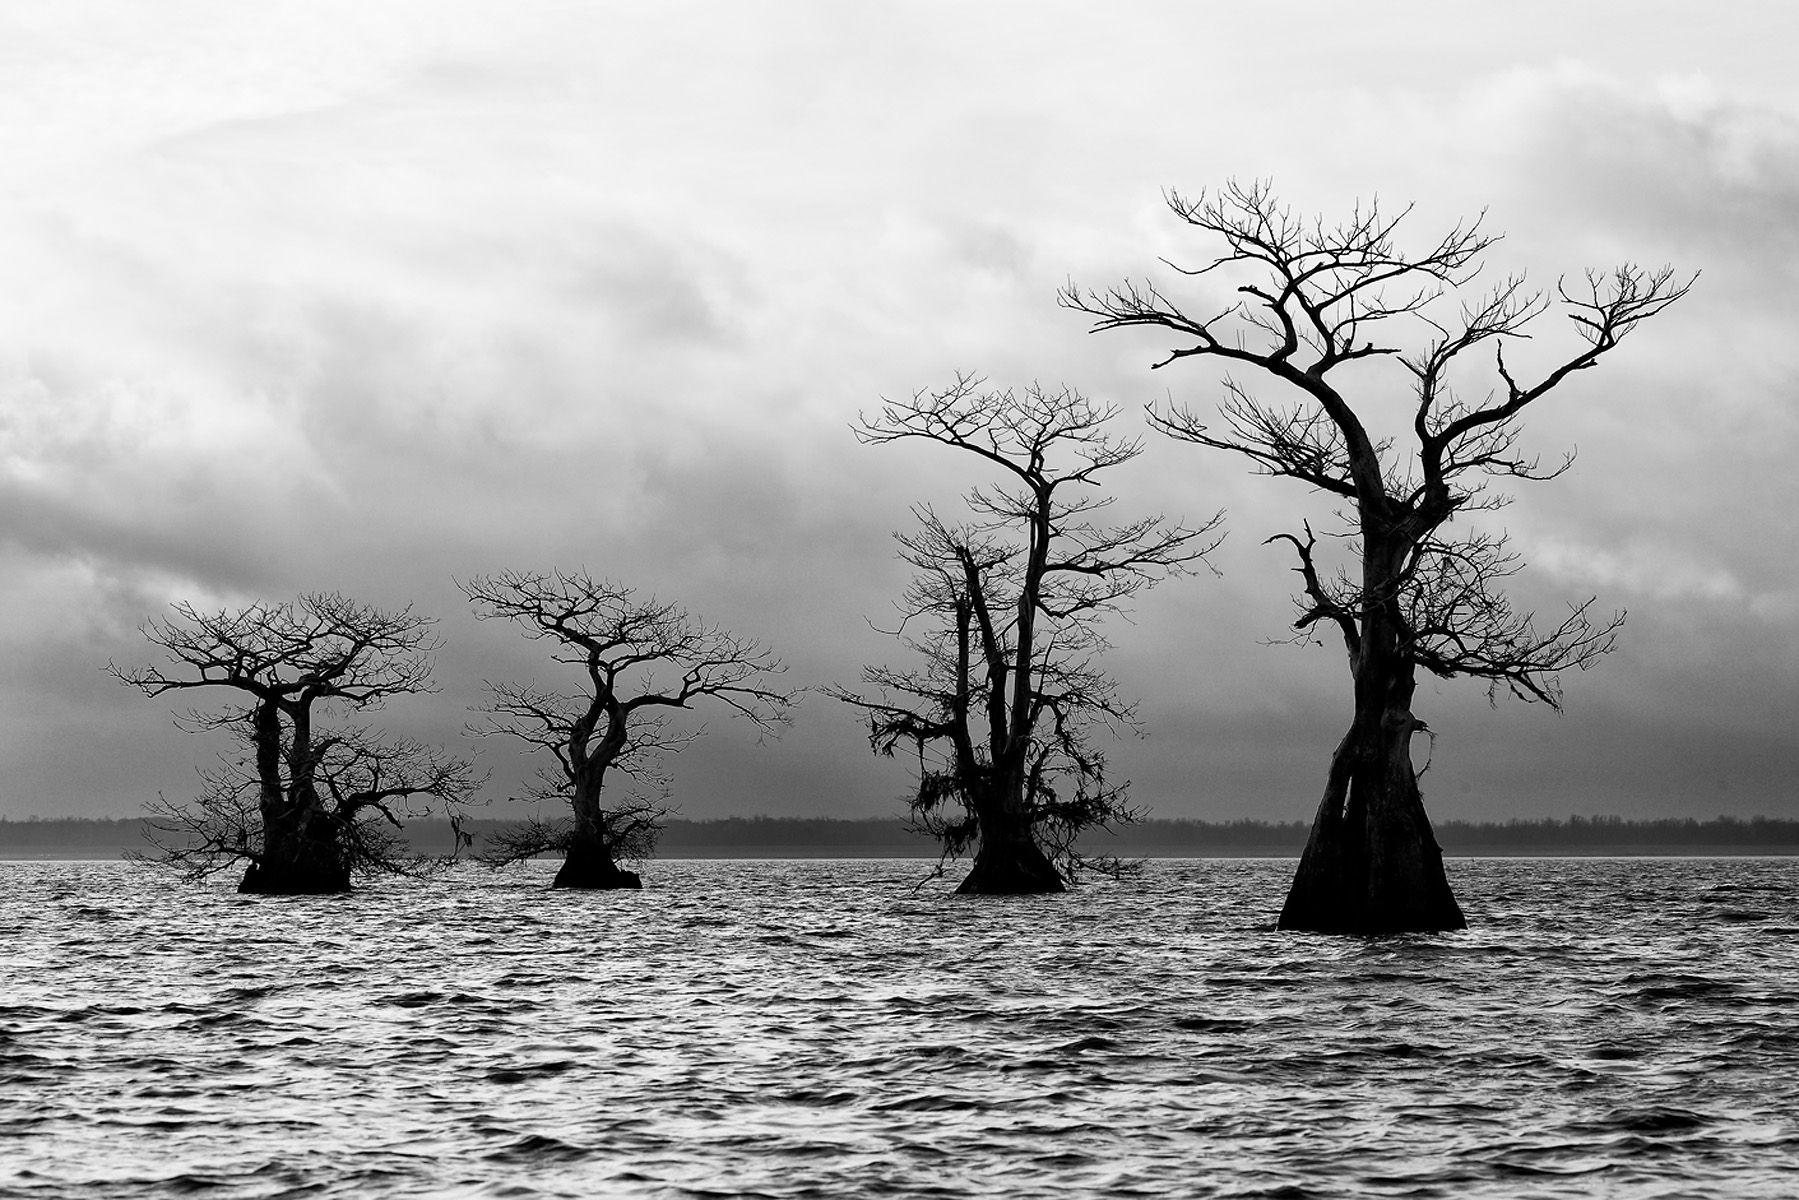 Cypress tree line up in the lake_B&W_A3I2418-Atchafalaya Basin, LA, USA.jpg